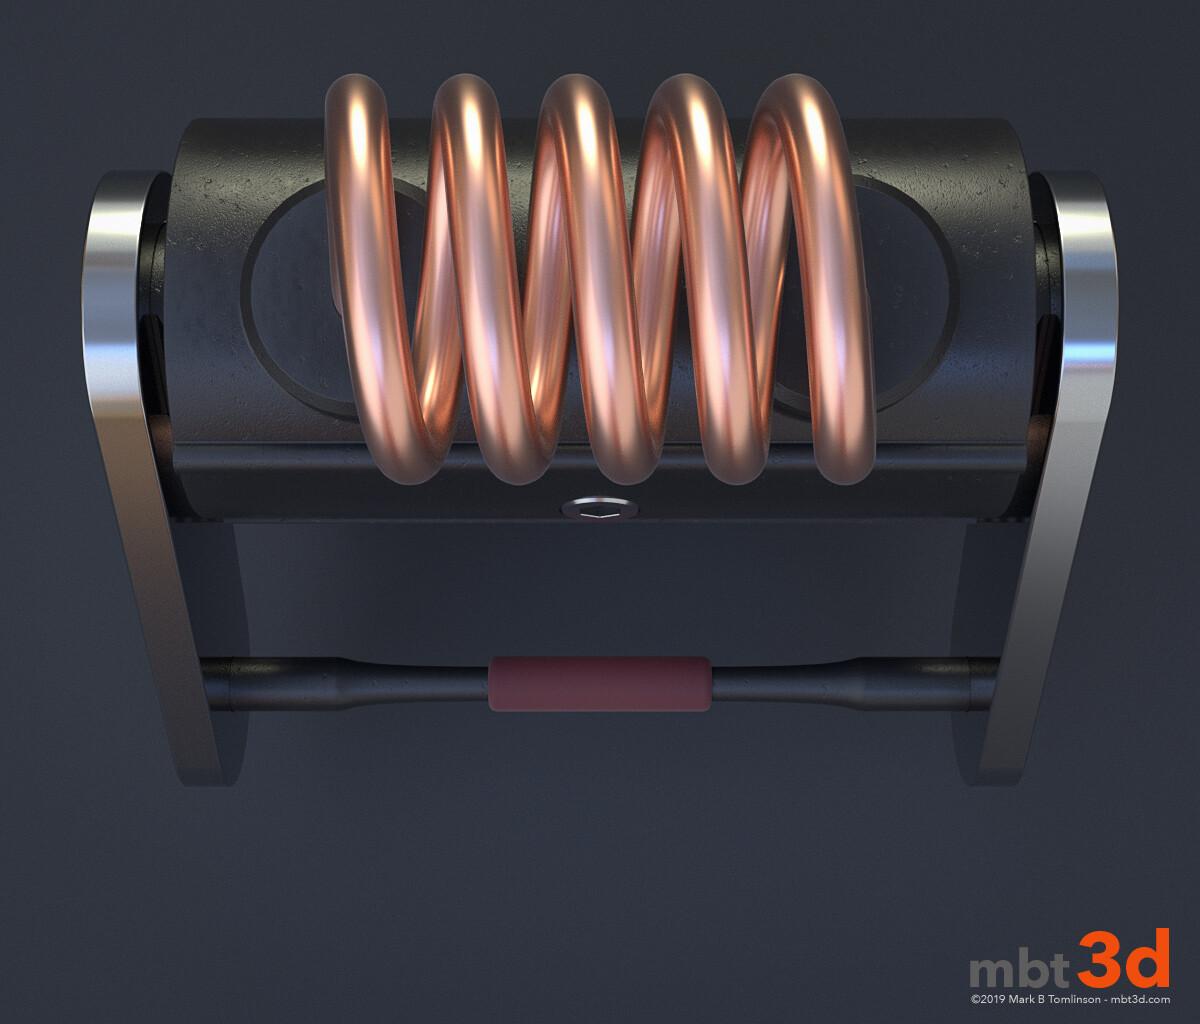 Mark b tomlinson coily 02